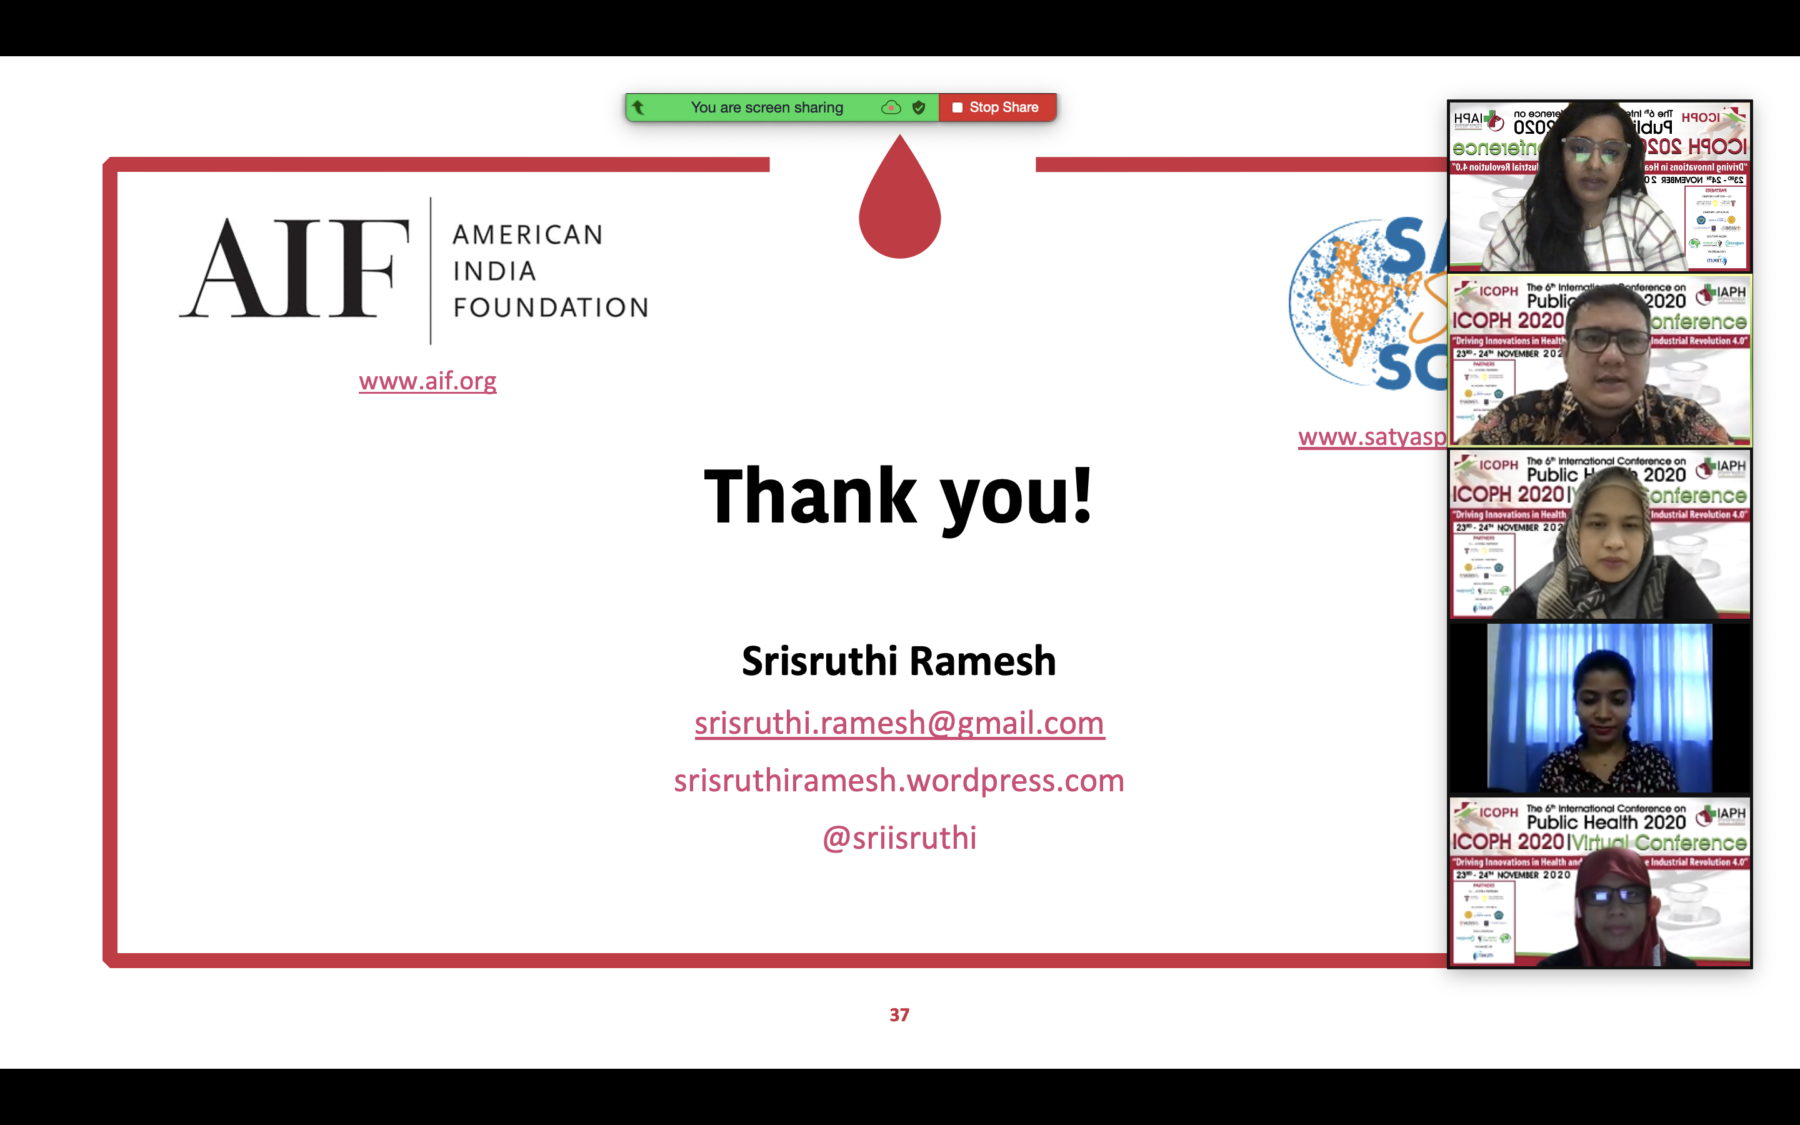 Srisruthi presenting on Zoom with her 4 co-presenters. Contact details: srisruthi.ramesh@gmail.com. srisruthiramesh.wordpress.com. Social media: @sriisruthi.